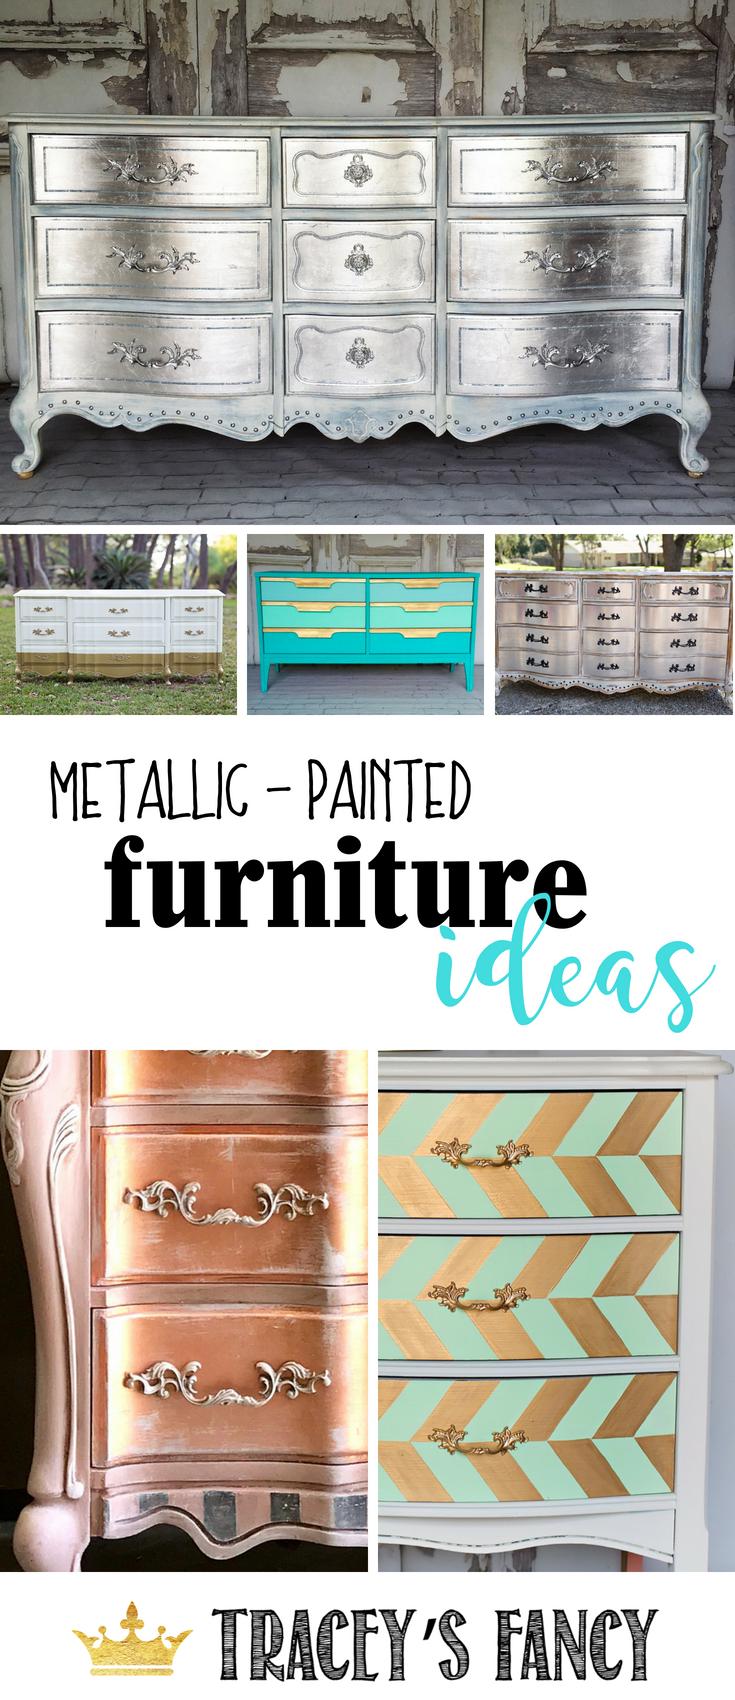 Tracey S Paint Blending Techniques For Furniture Tracey S Fancy Painted Furniture Metallic Painted Furniture Gold Painted Furniture